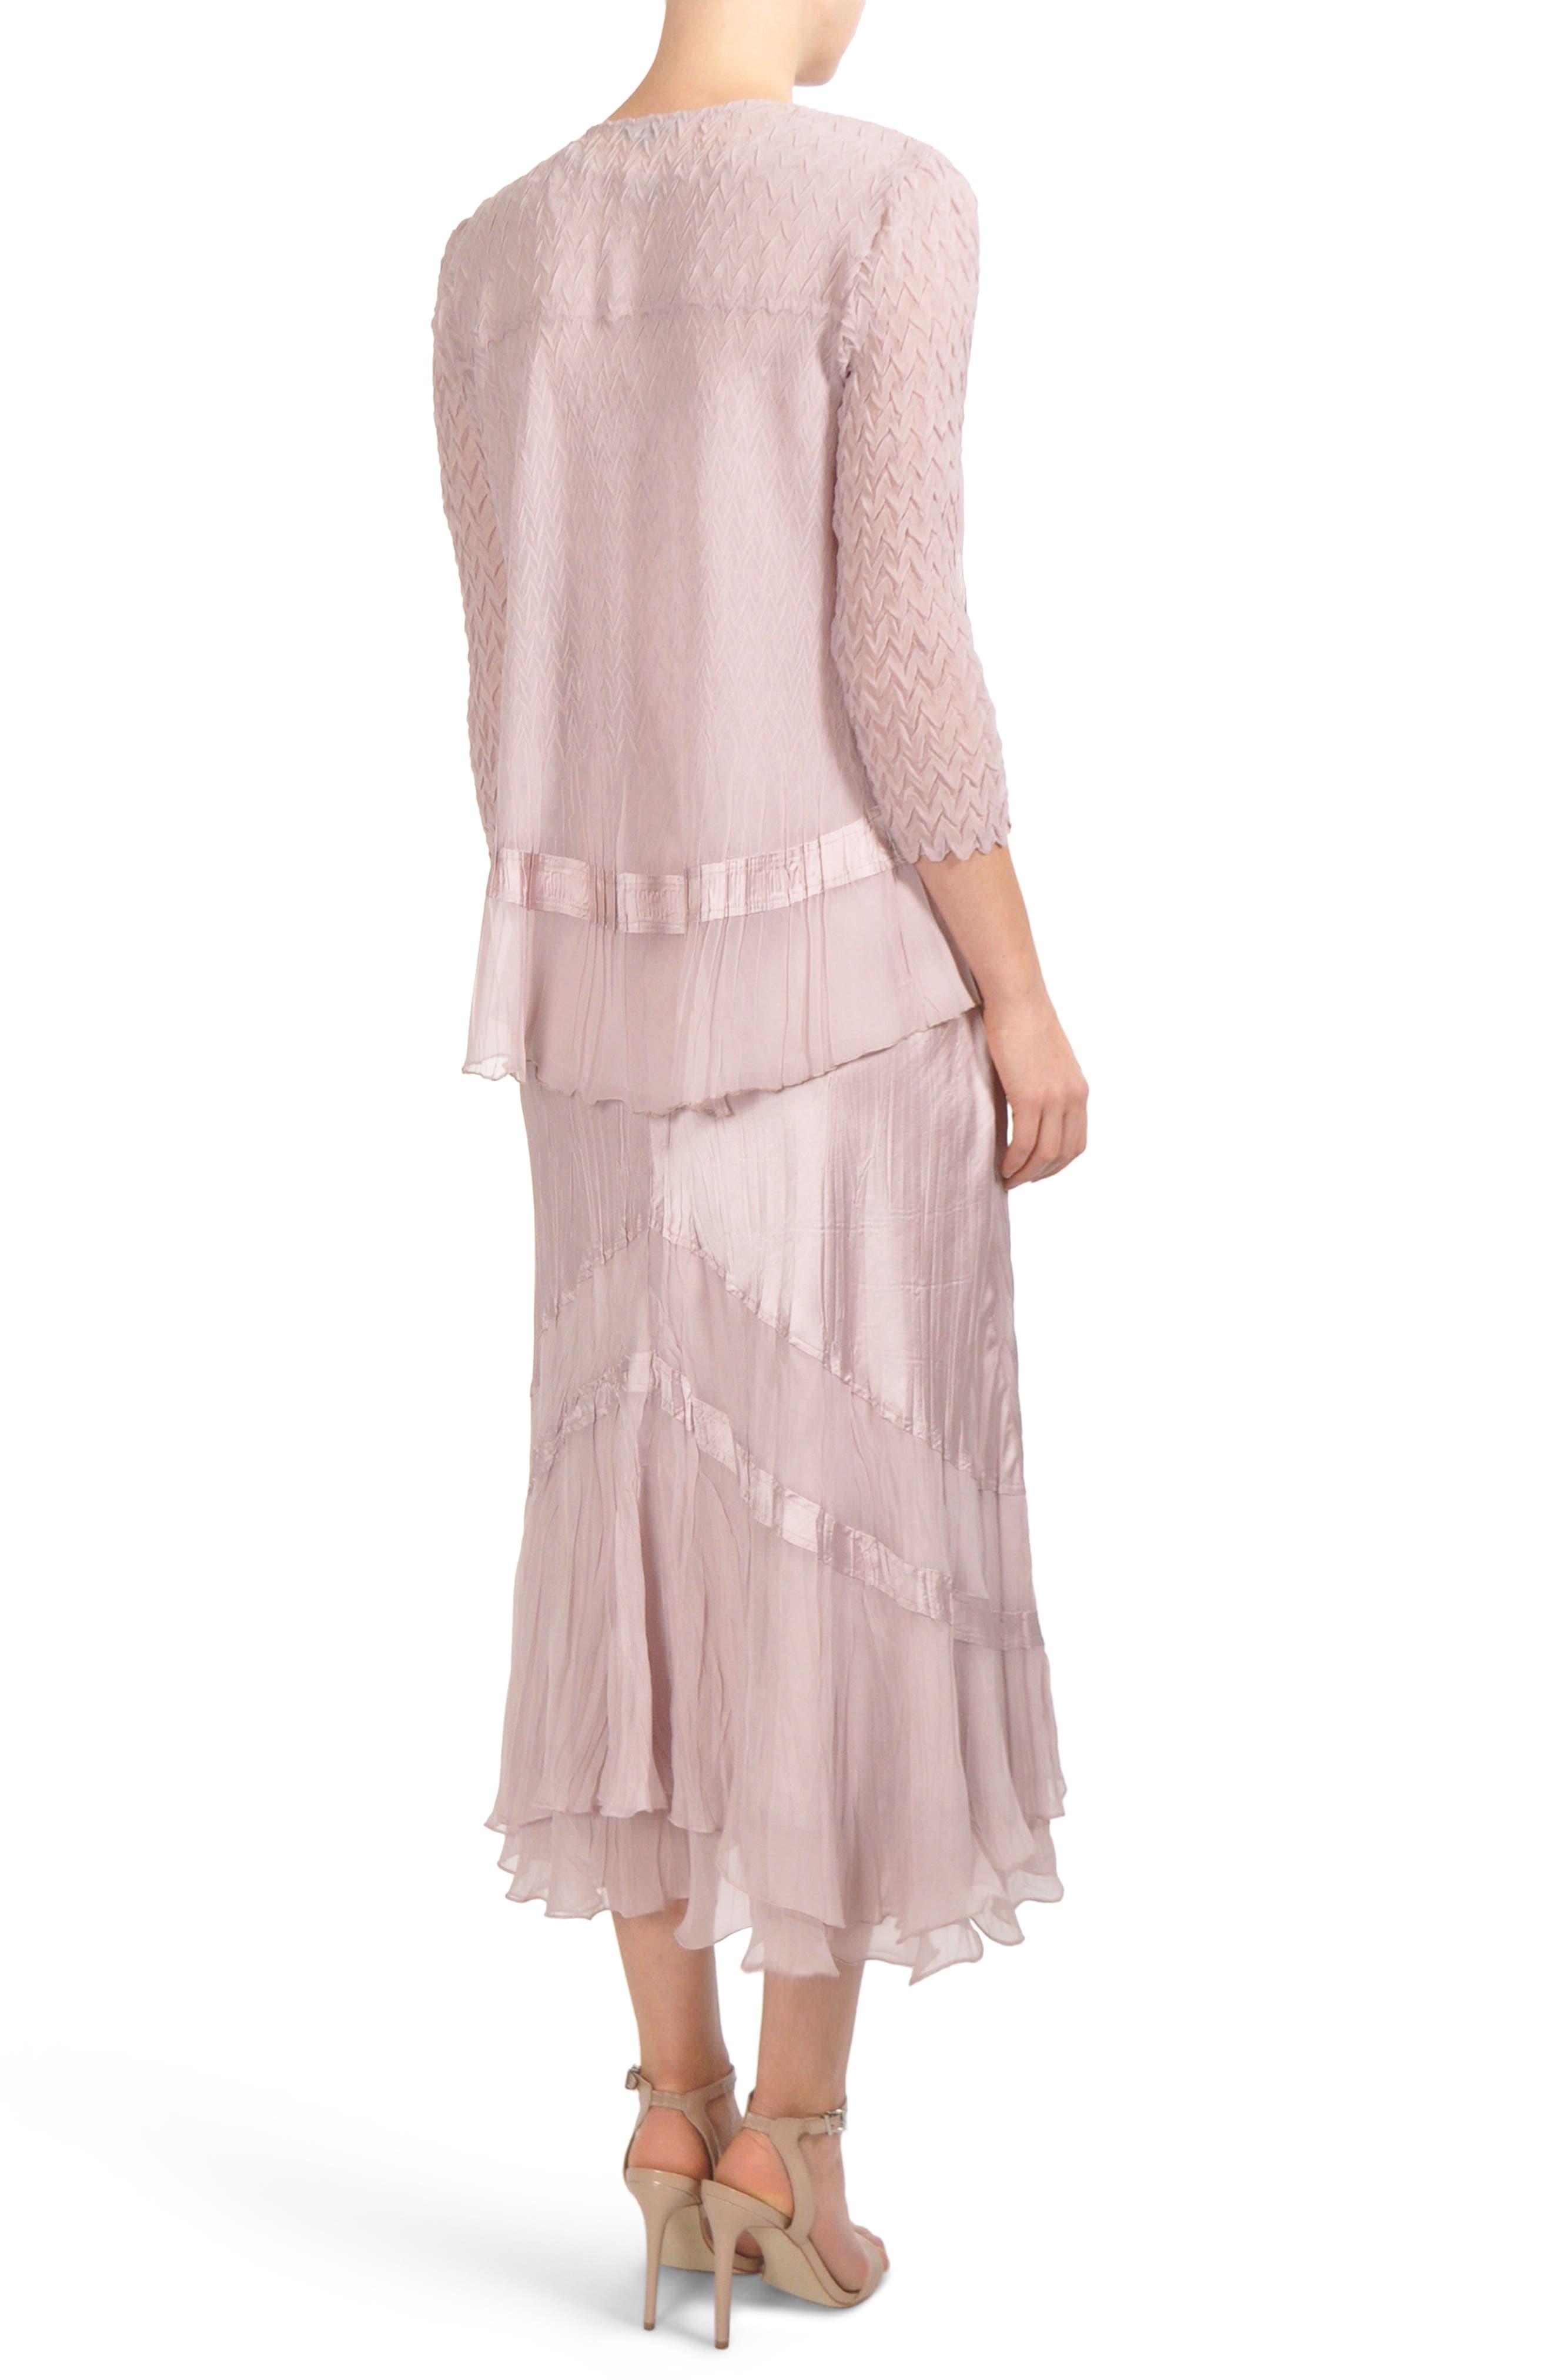 Embellished Tiered Hem Dress With Jacket,                             Alternate thumbnail 2, color,                             030